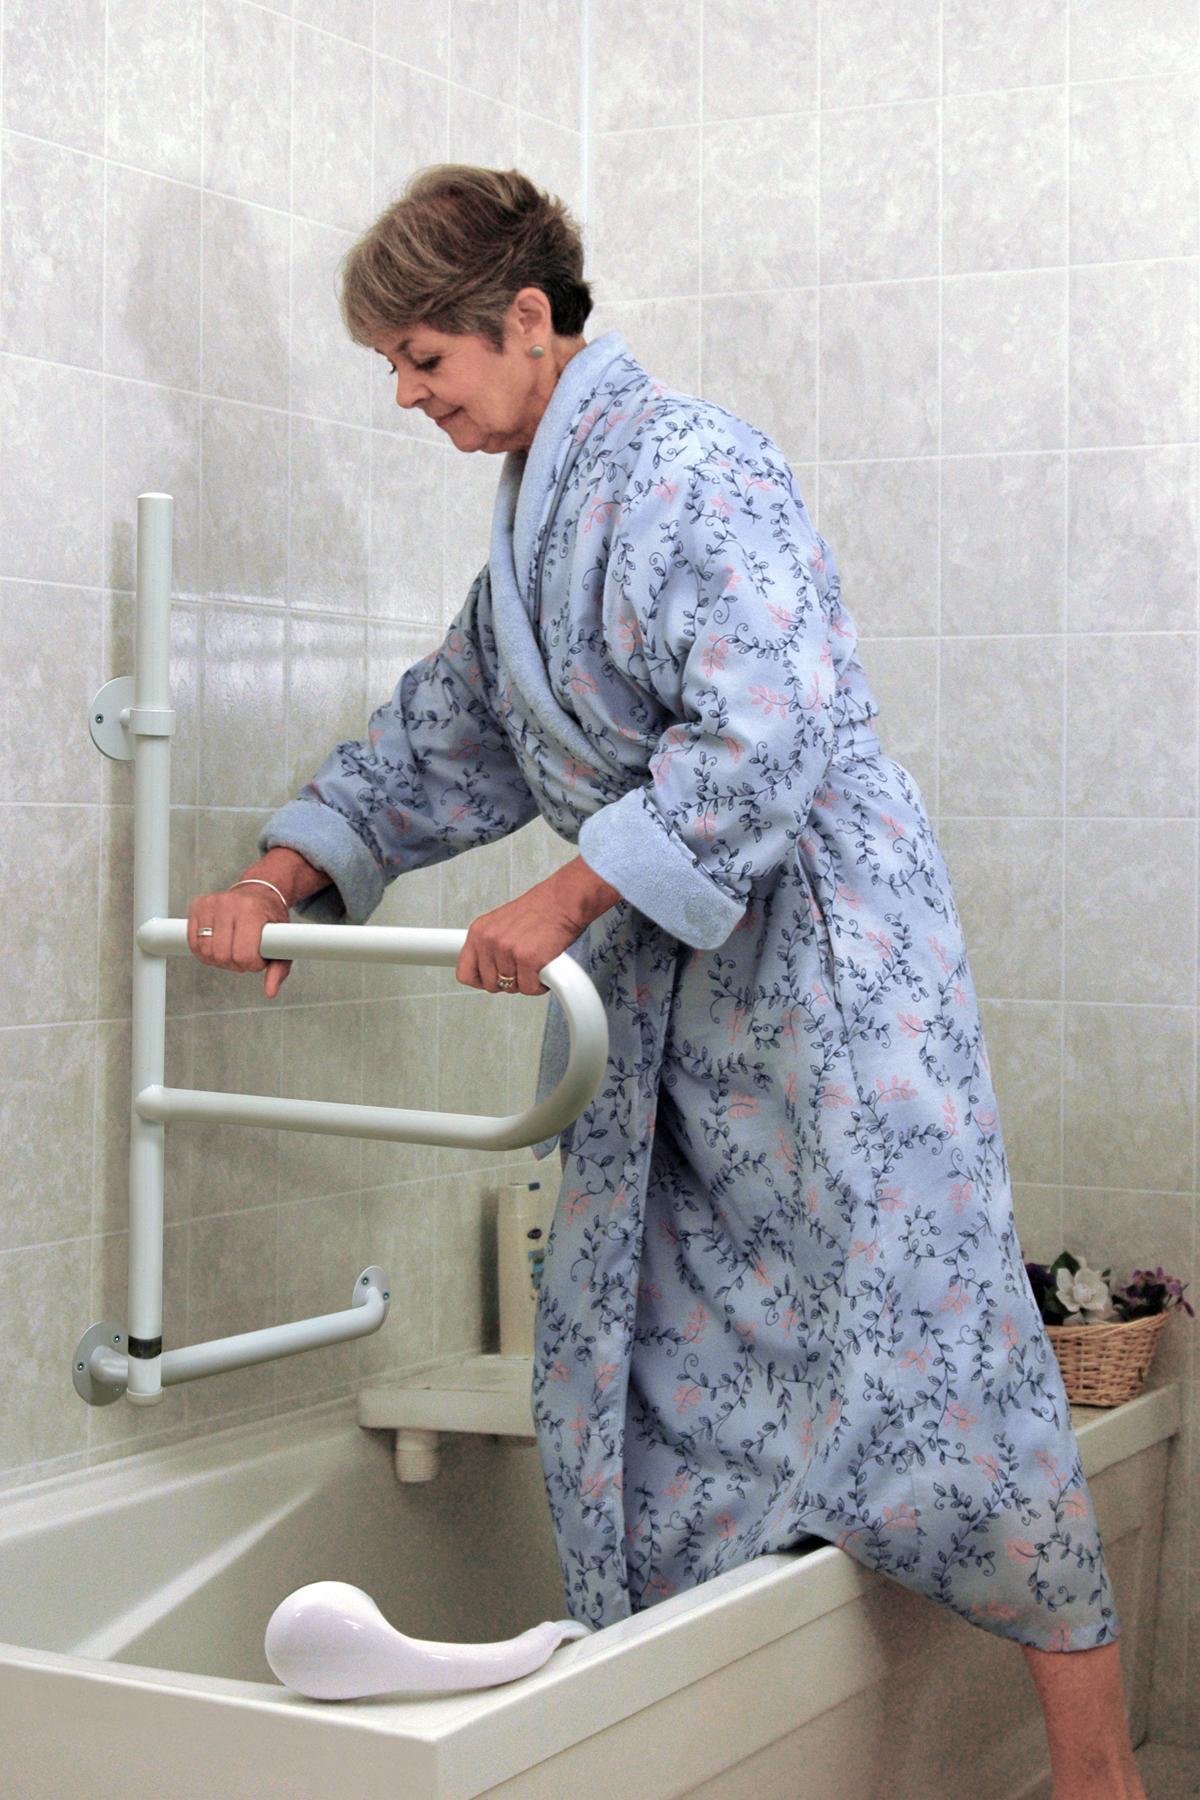 home bathroom safety photo - 5